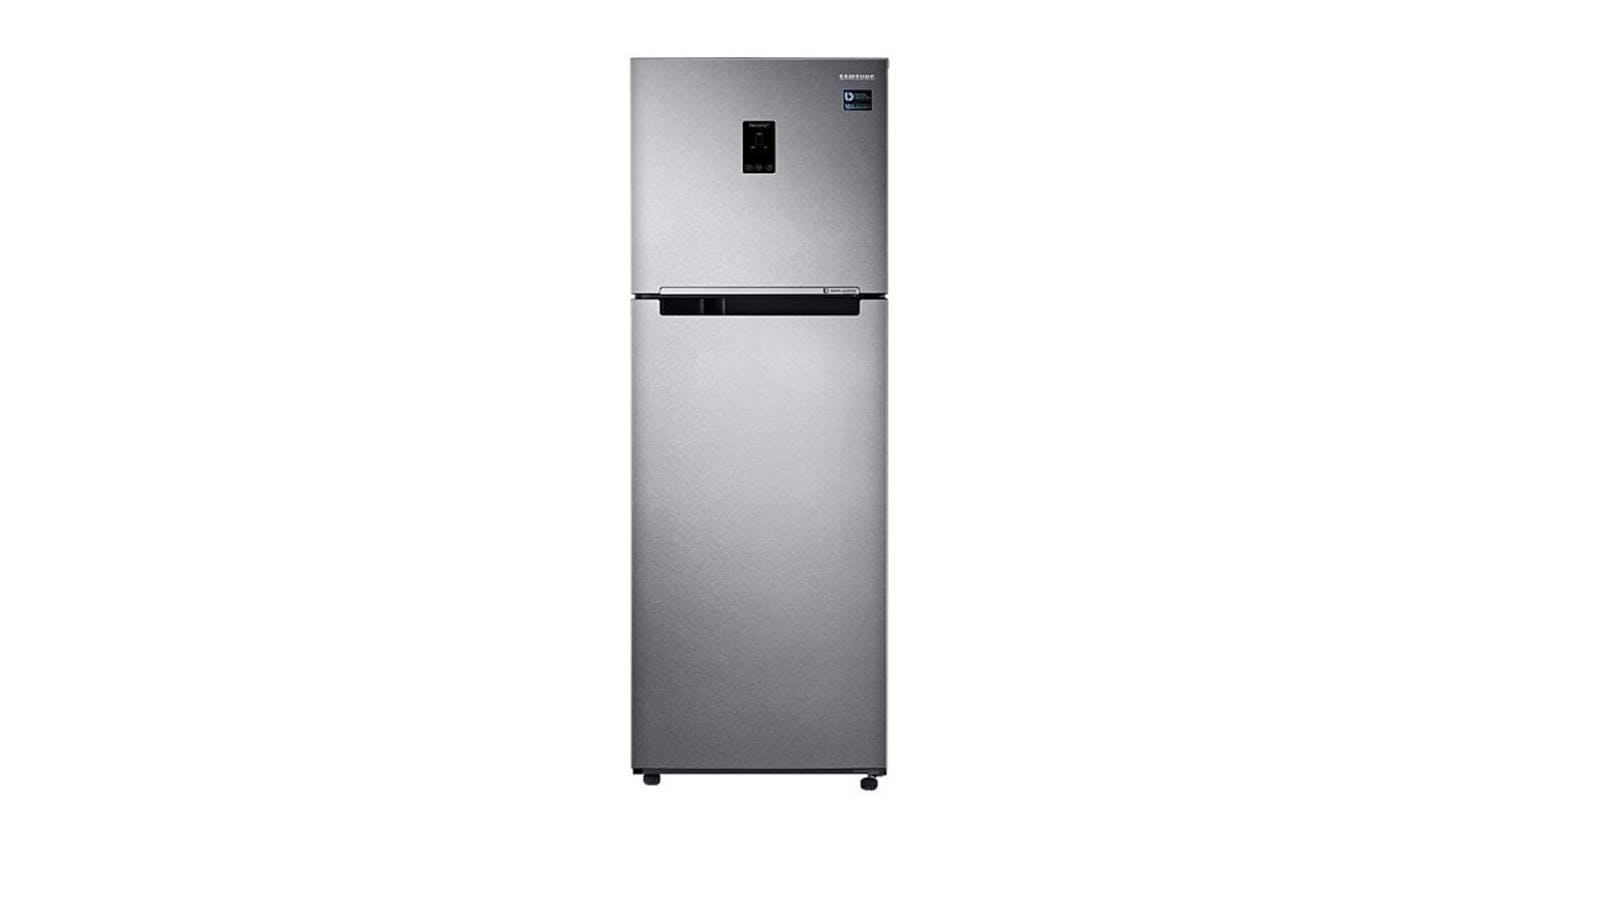 Samsung 410l 2 Door Top Freezer Refrigerator Silver